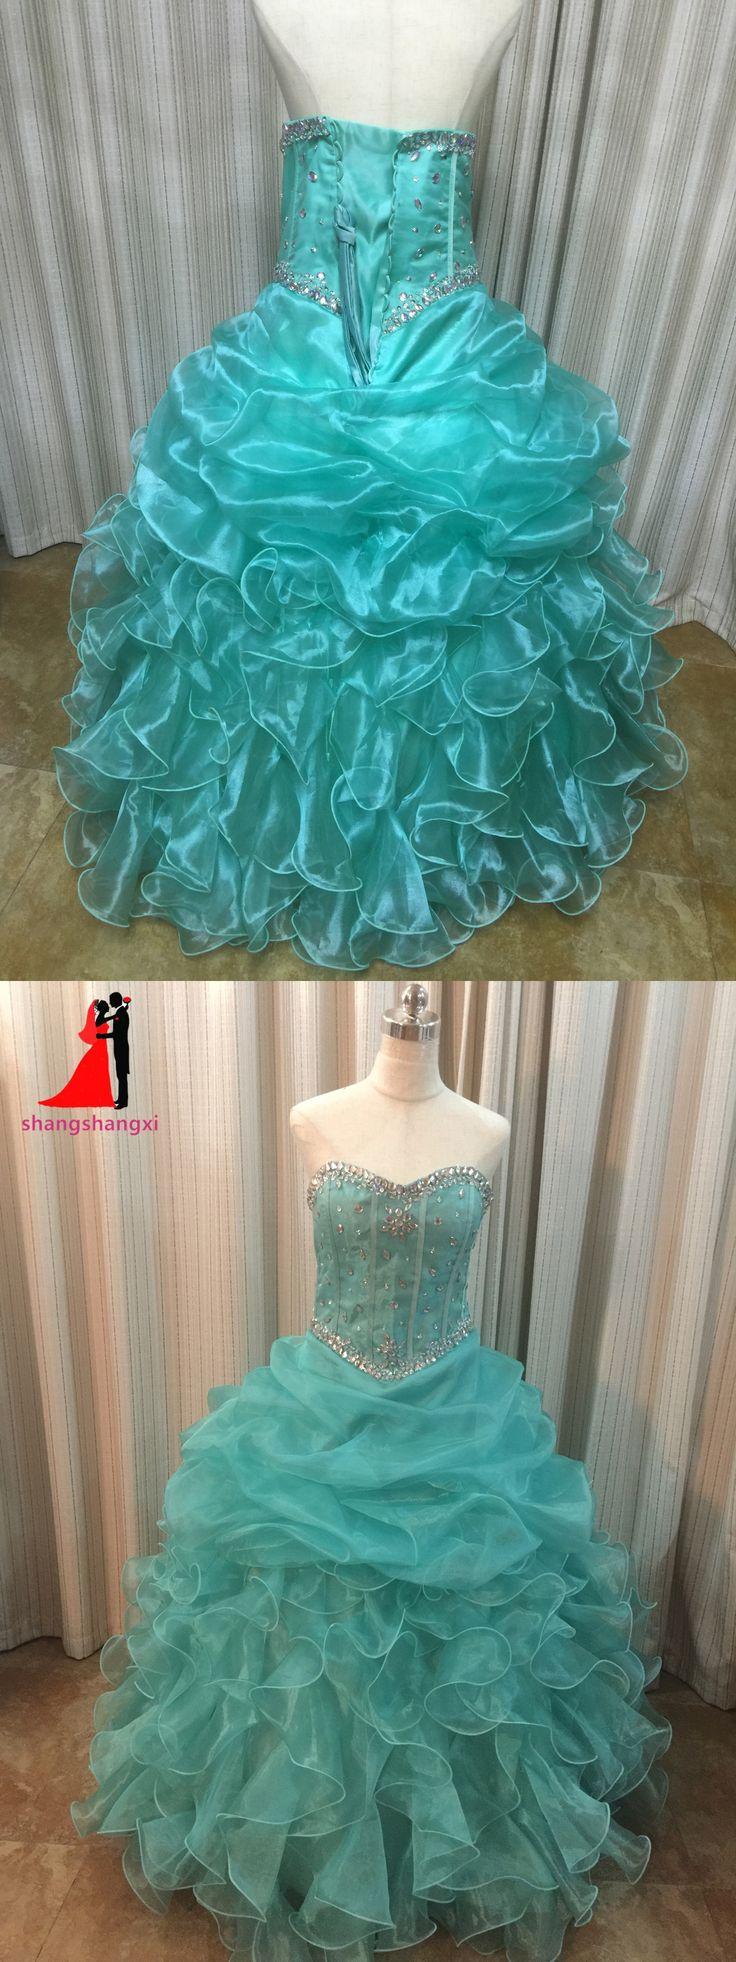 best quinceanera dresses images on pinterest